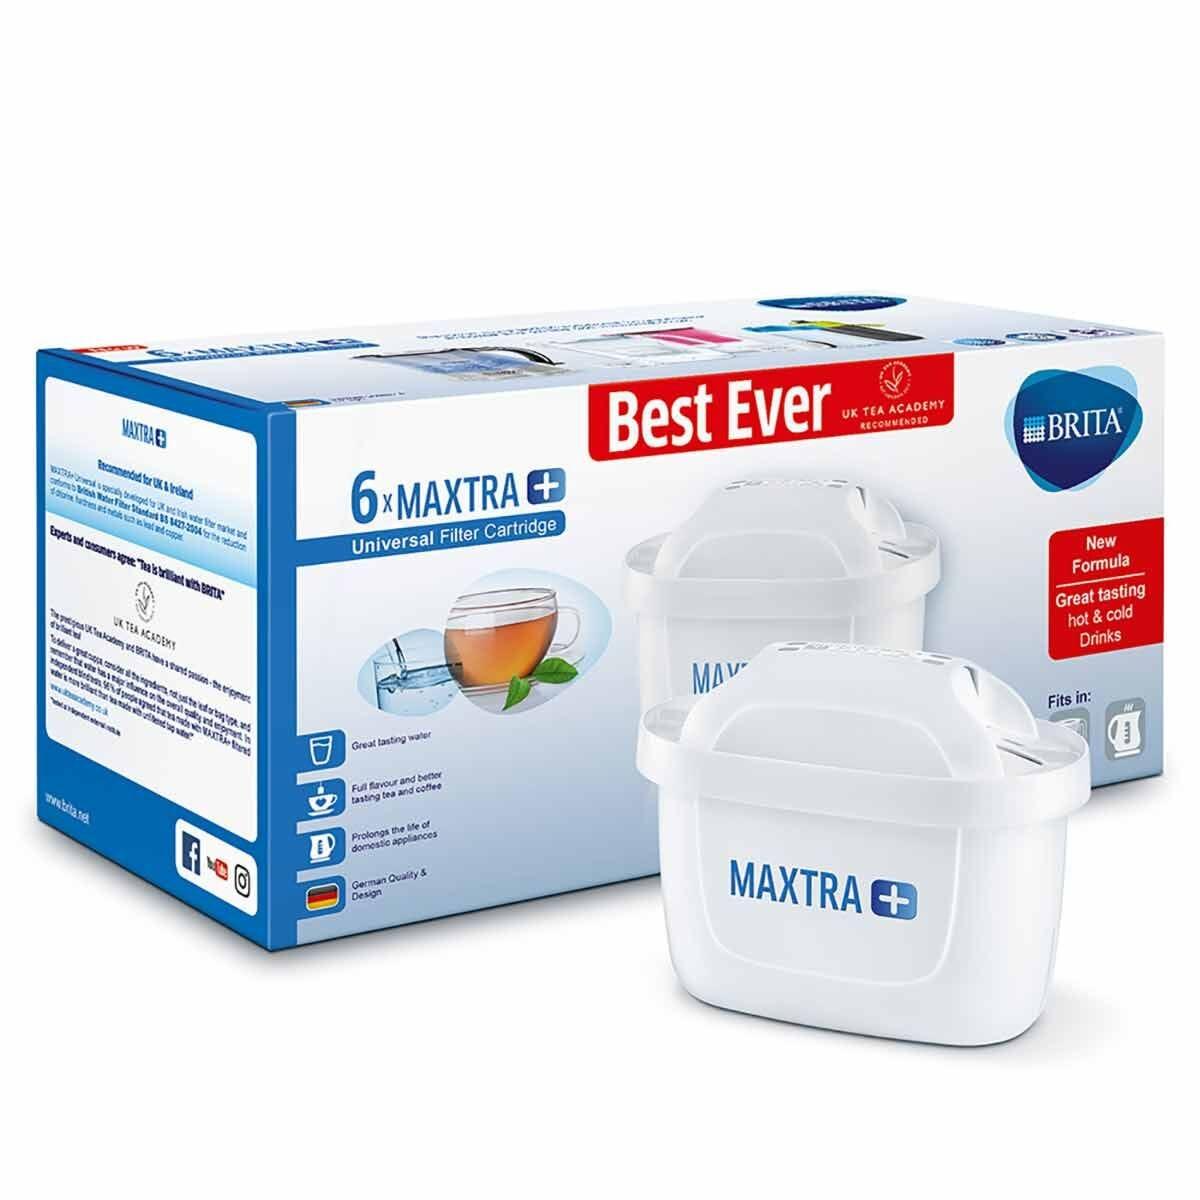 BRITA MAXTRA Plus Filter Cartridge Pack of 6